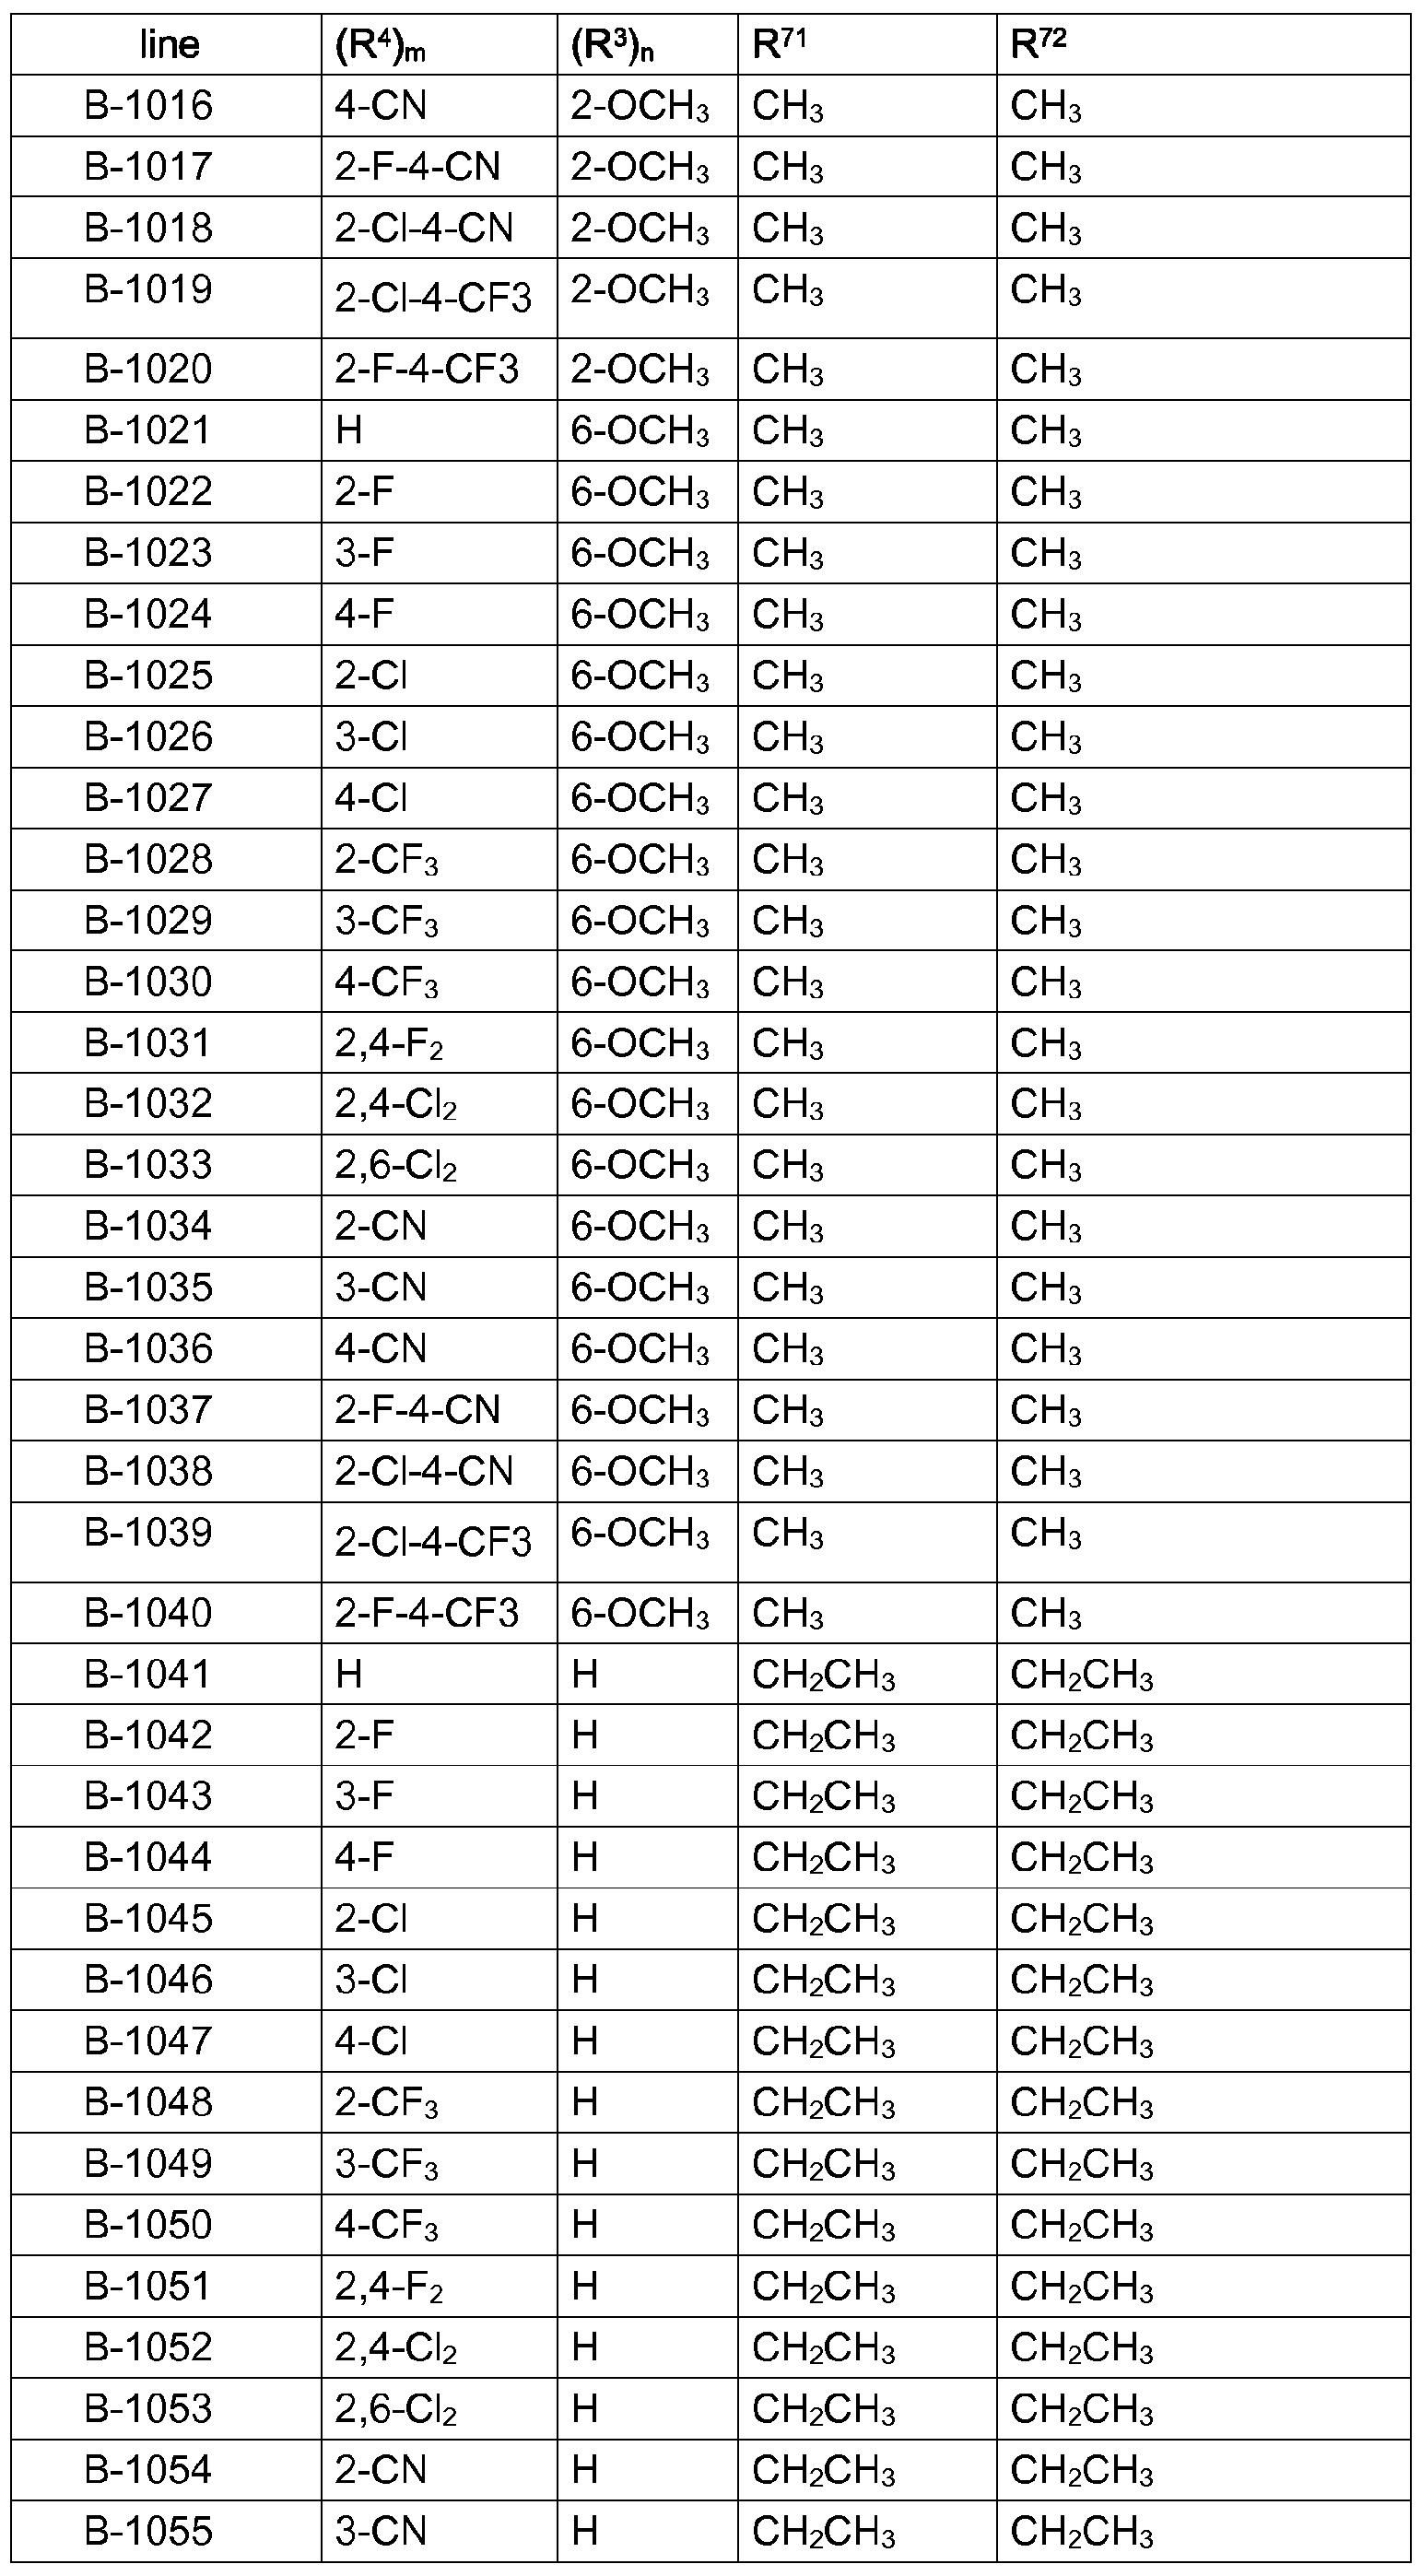 b1035 code nissan maxima